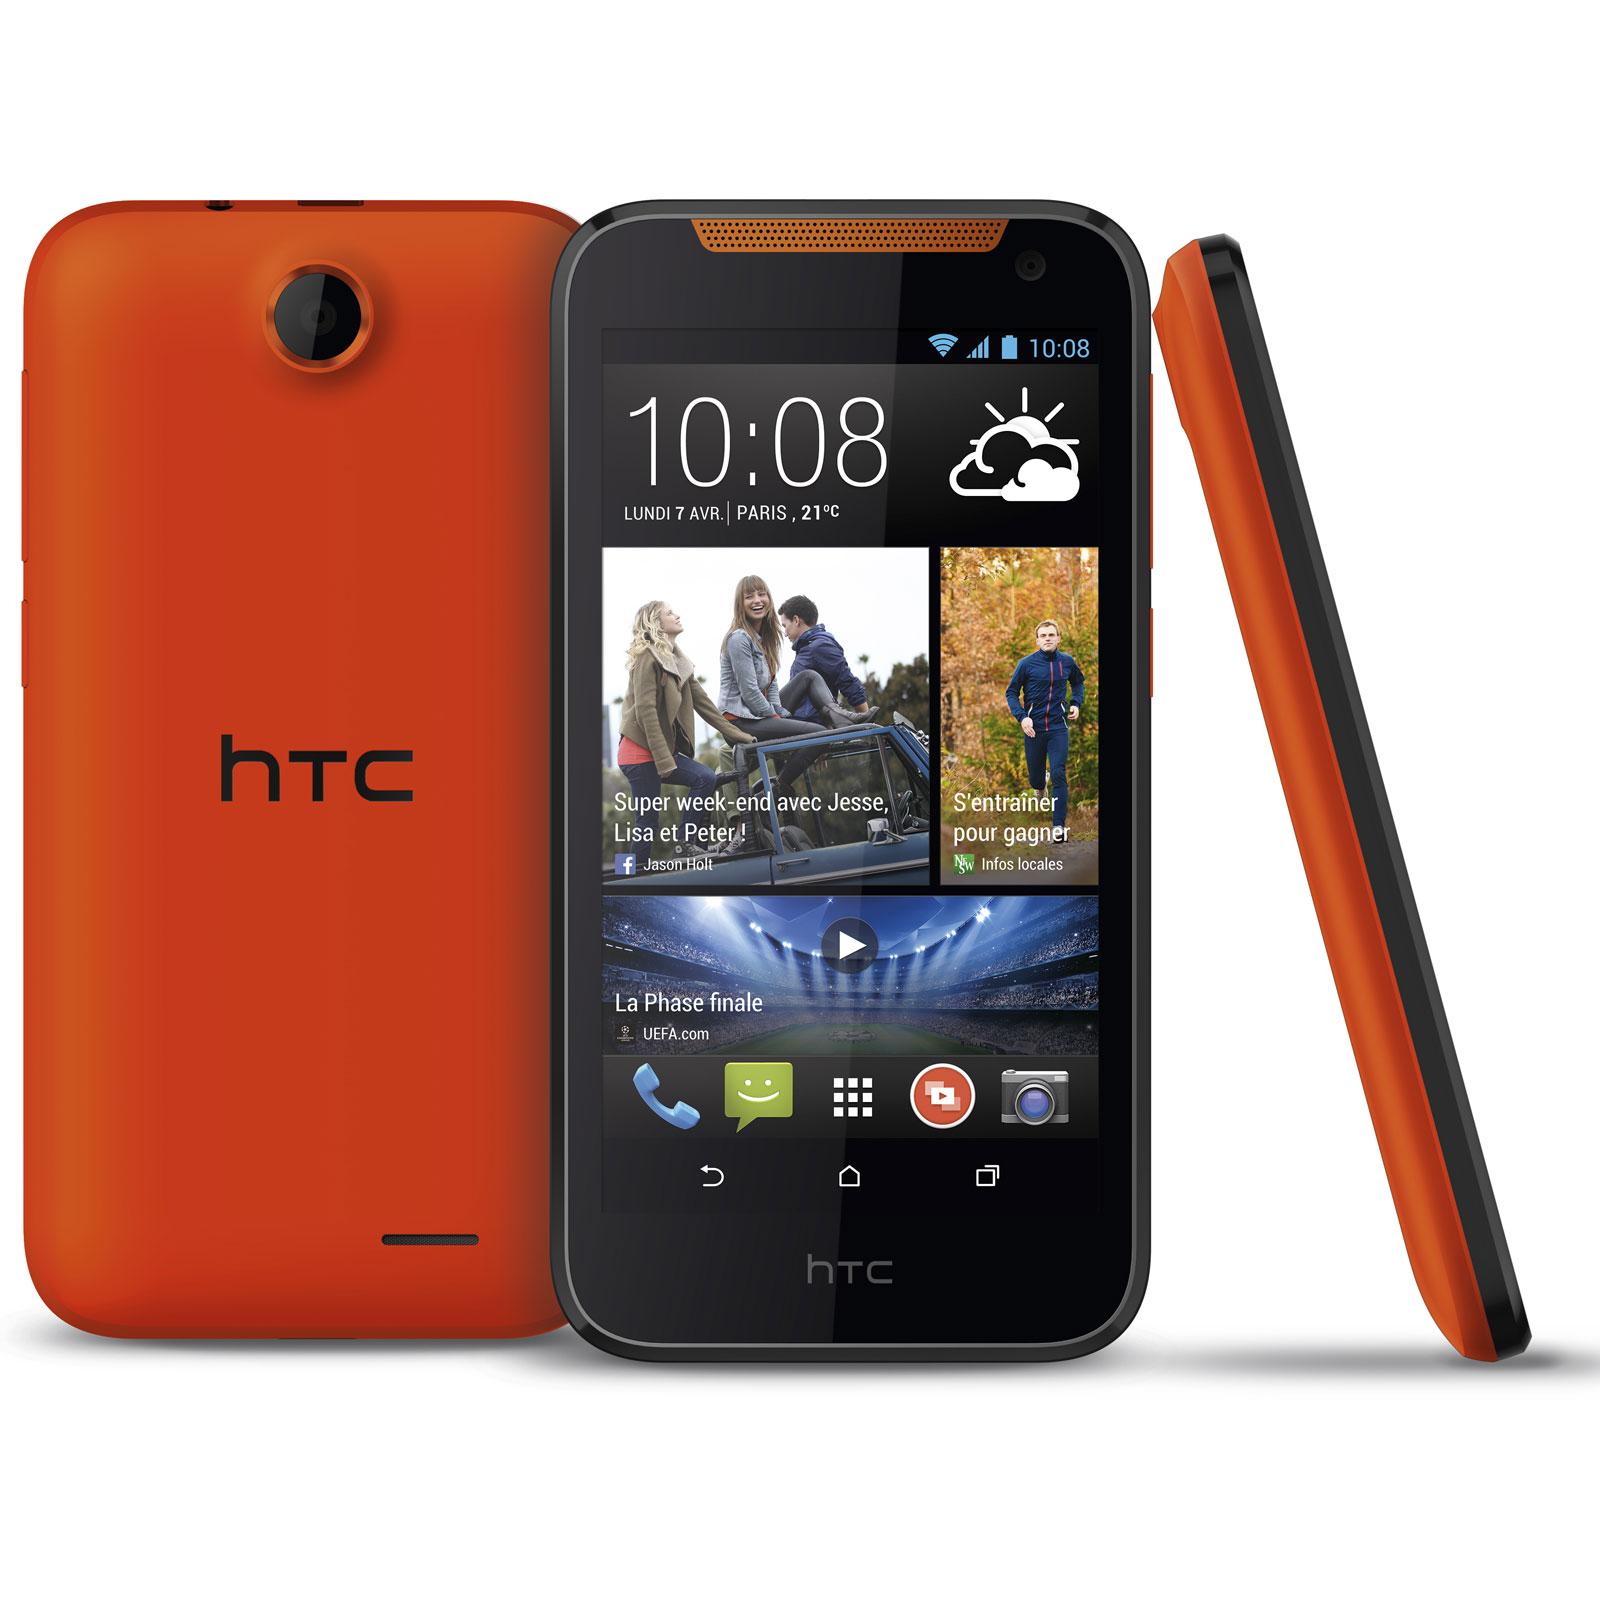 htc desire 310 orange mobile smartphone htc sur. Black Bedroom Furniture Sets. Home Design Ideas